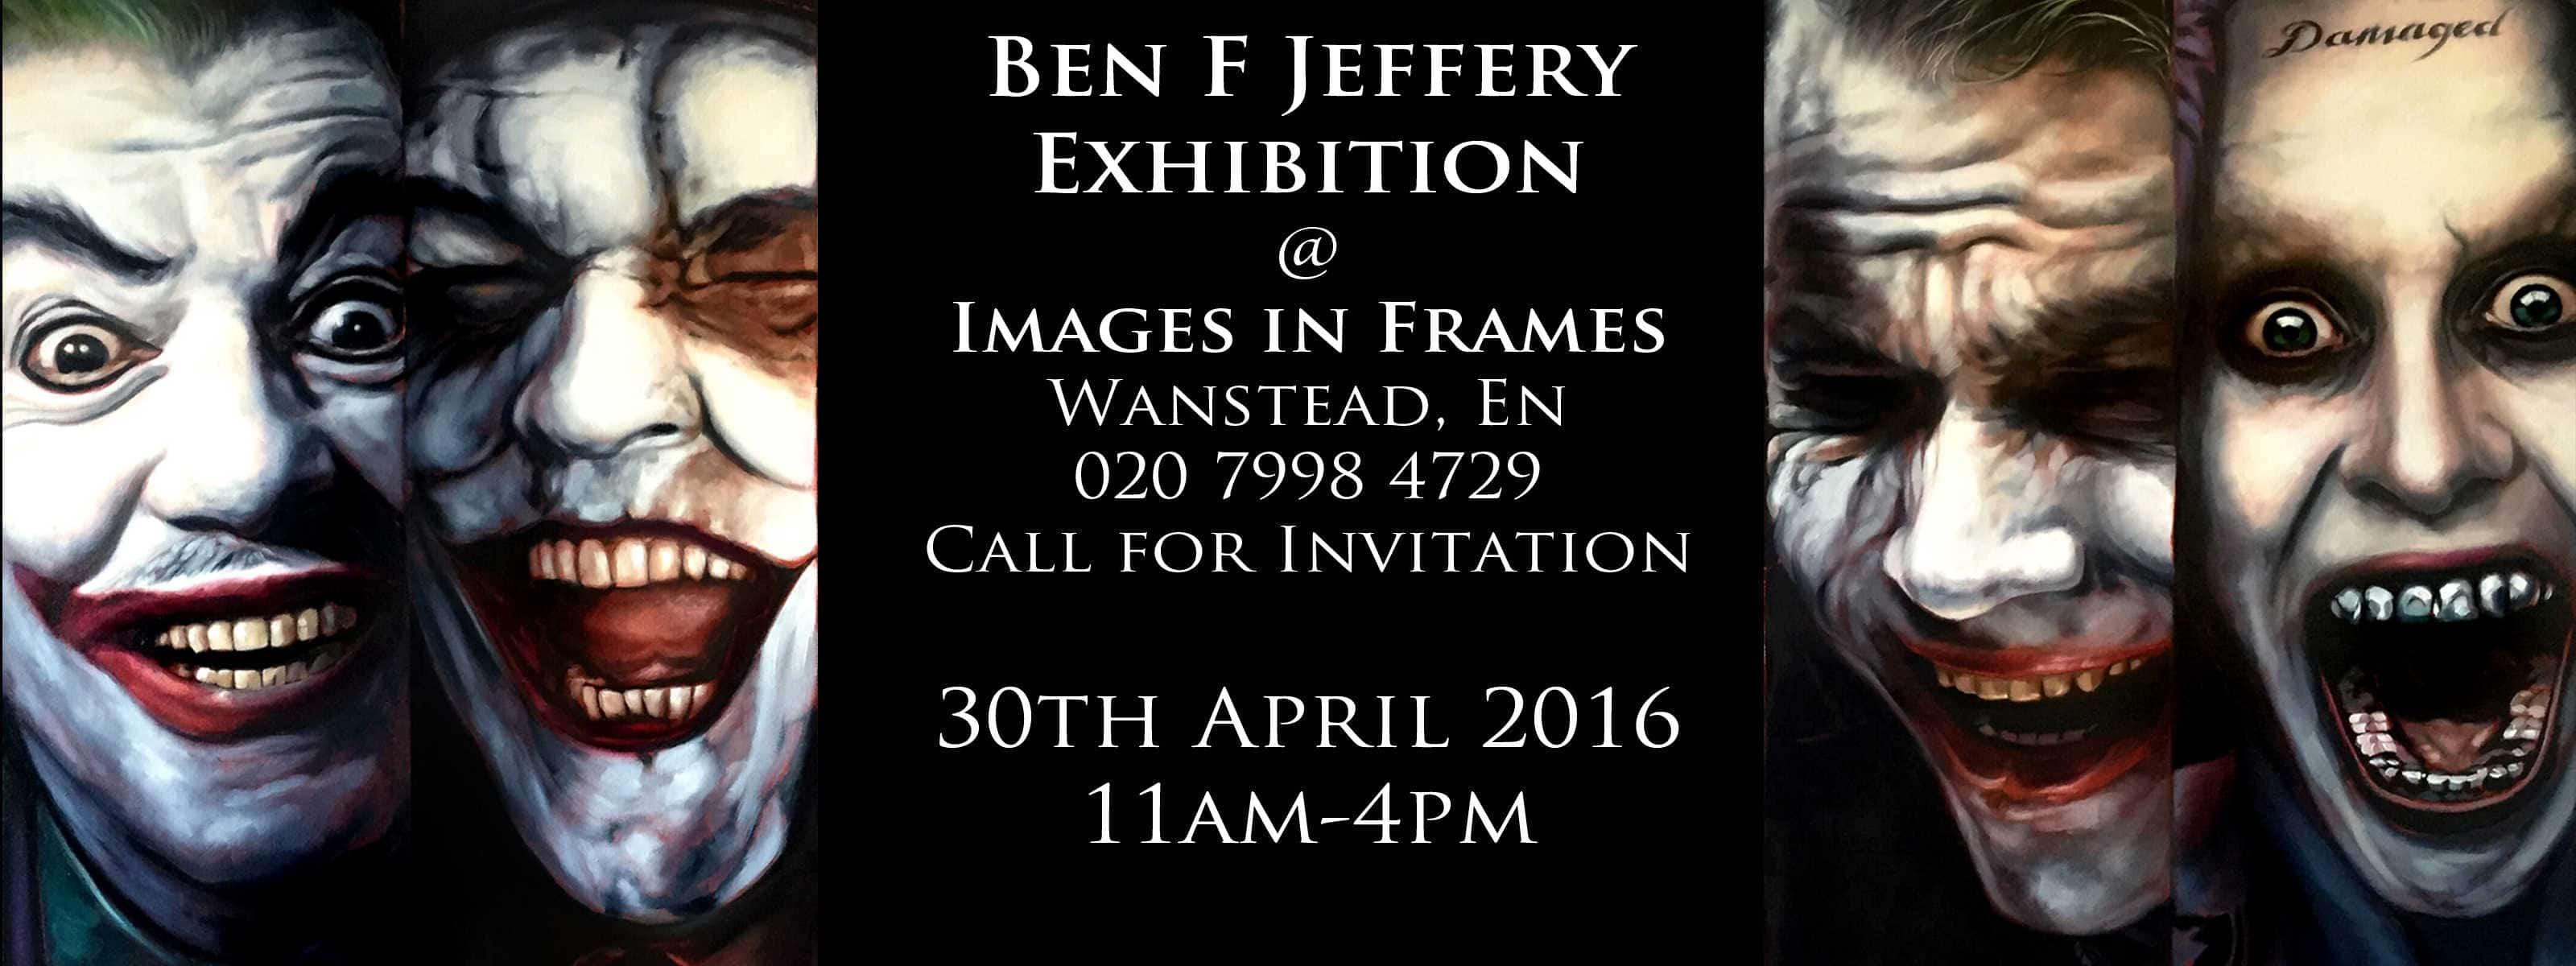 Ben Jeffery Artist